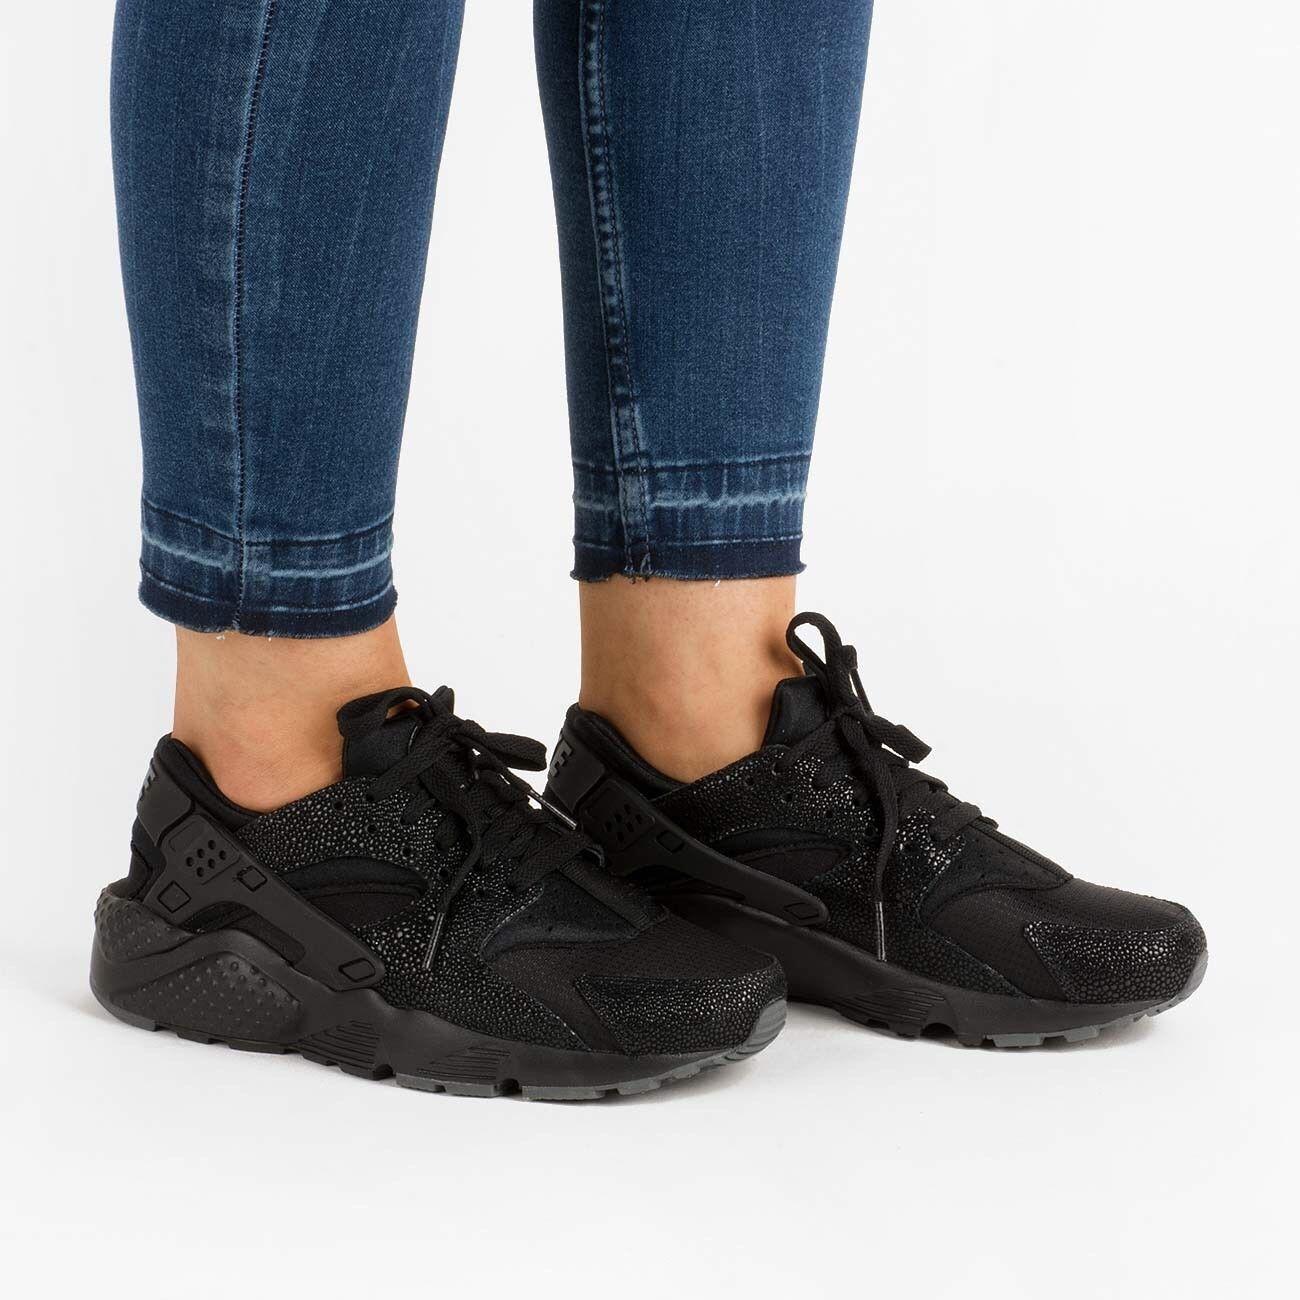 Nike Huarache Run 6 se (GS) juventud tamaño 6 Run (909143 001) Negro 6e156a